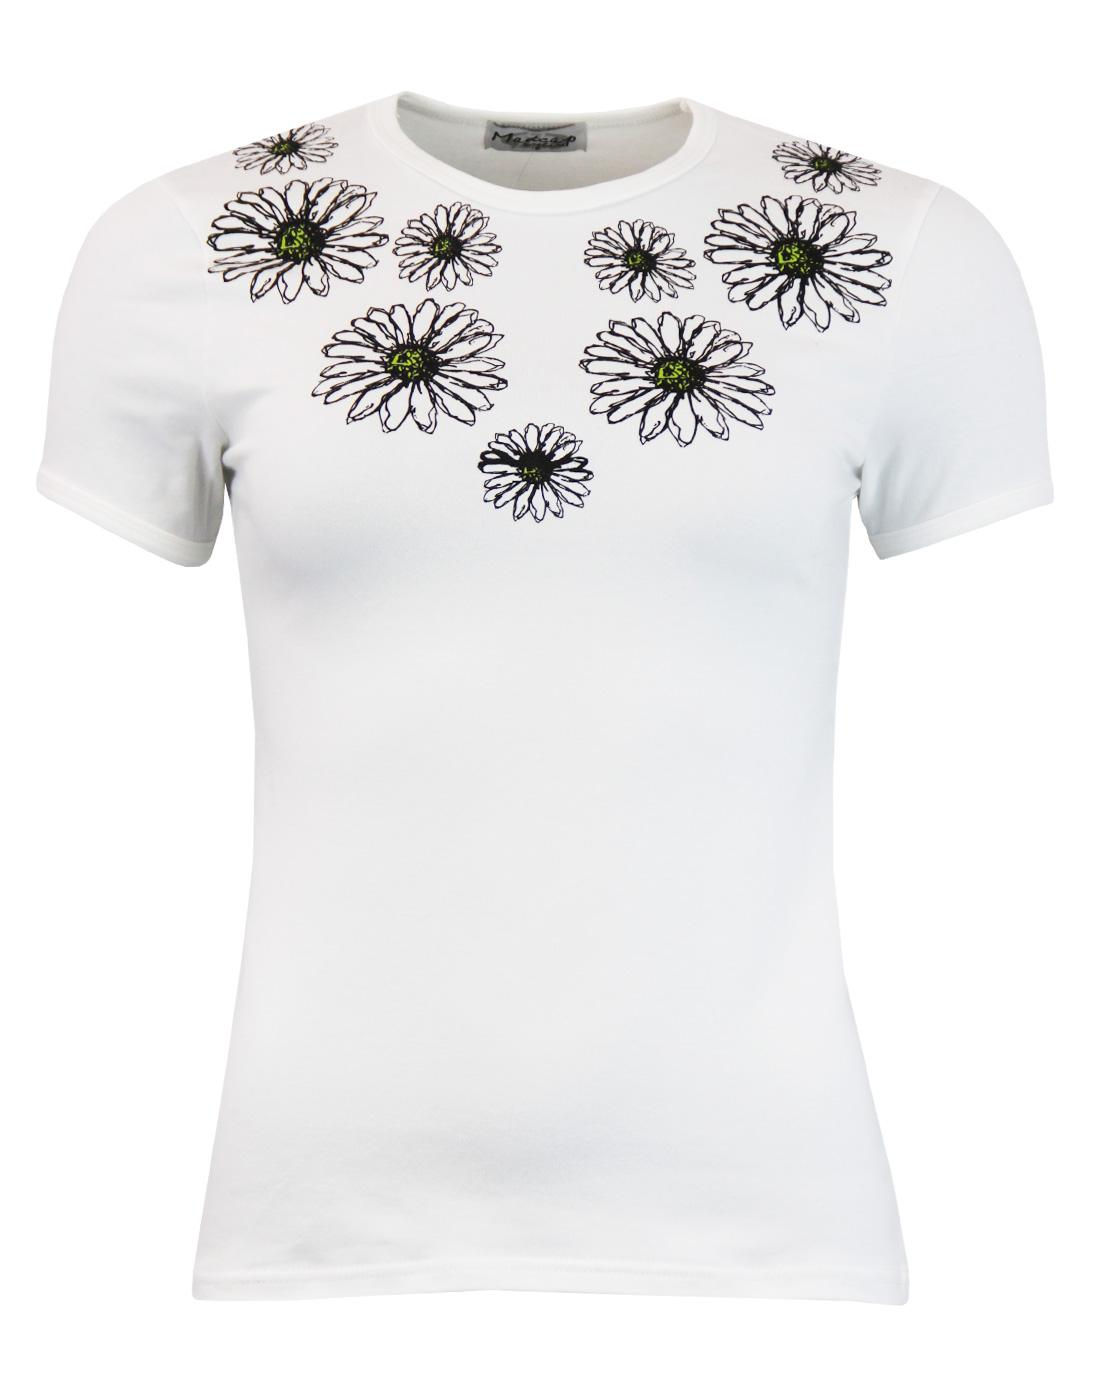 madcap daisy tee white mod